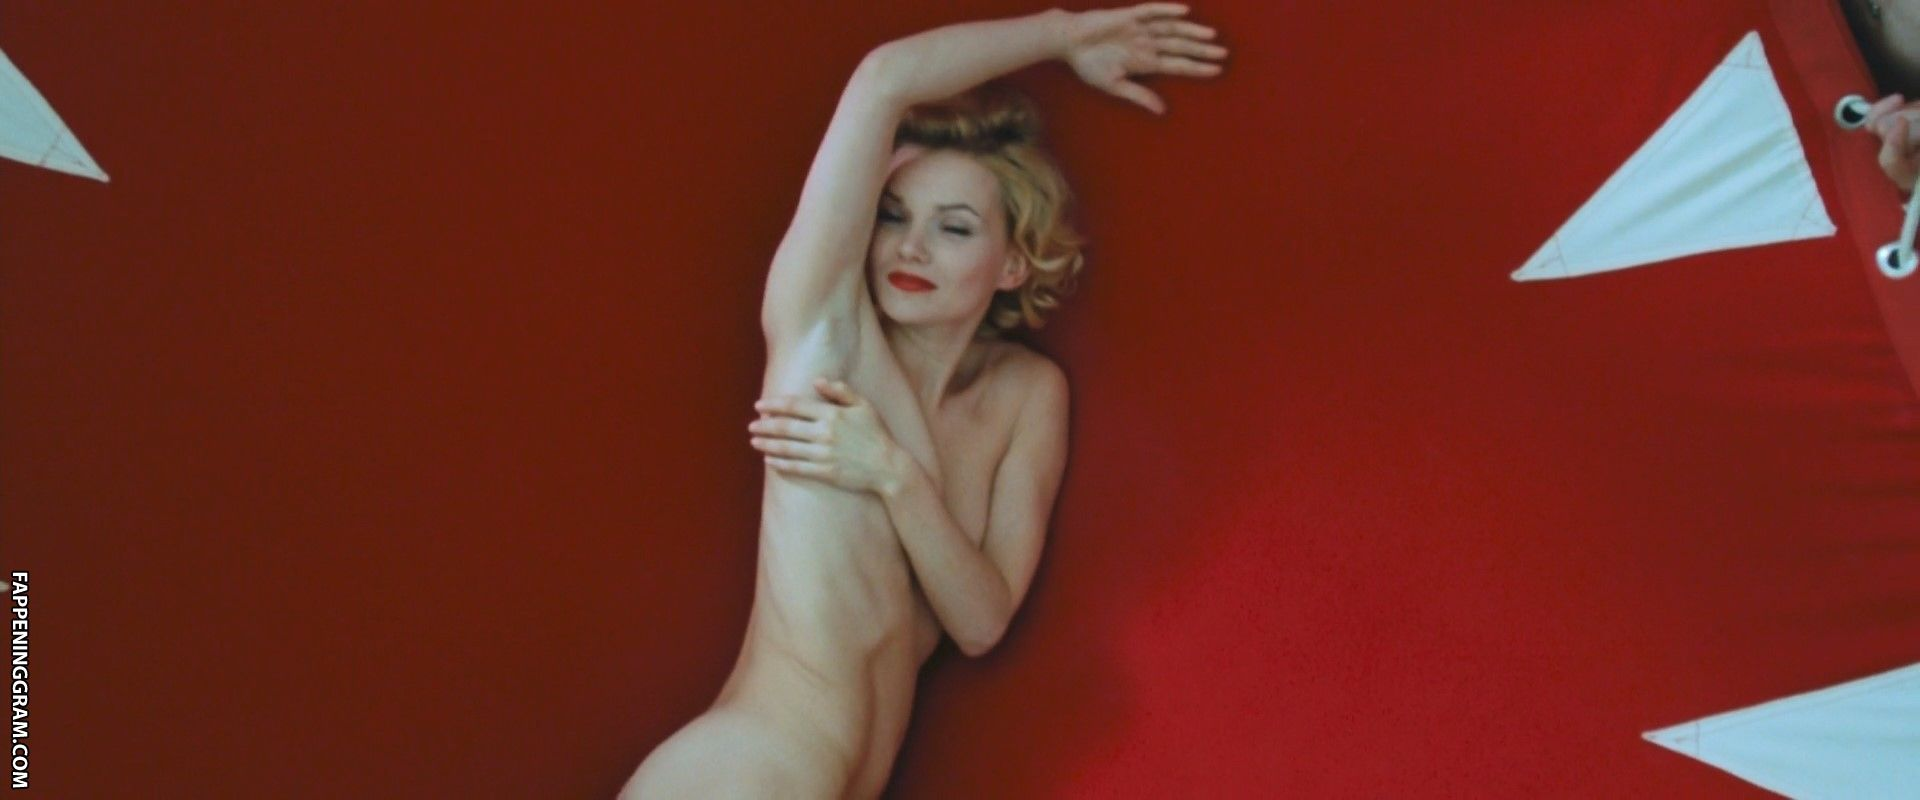 Sophie nackt Habboo Sophie Habboo